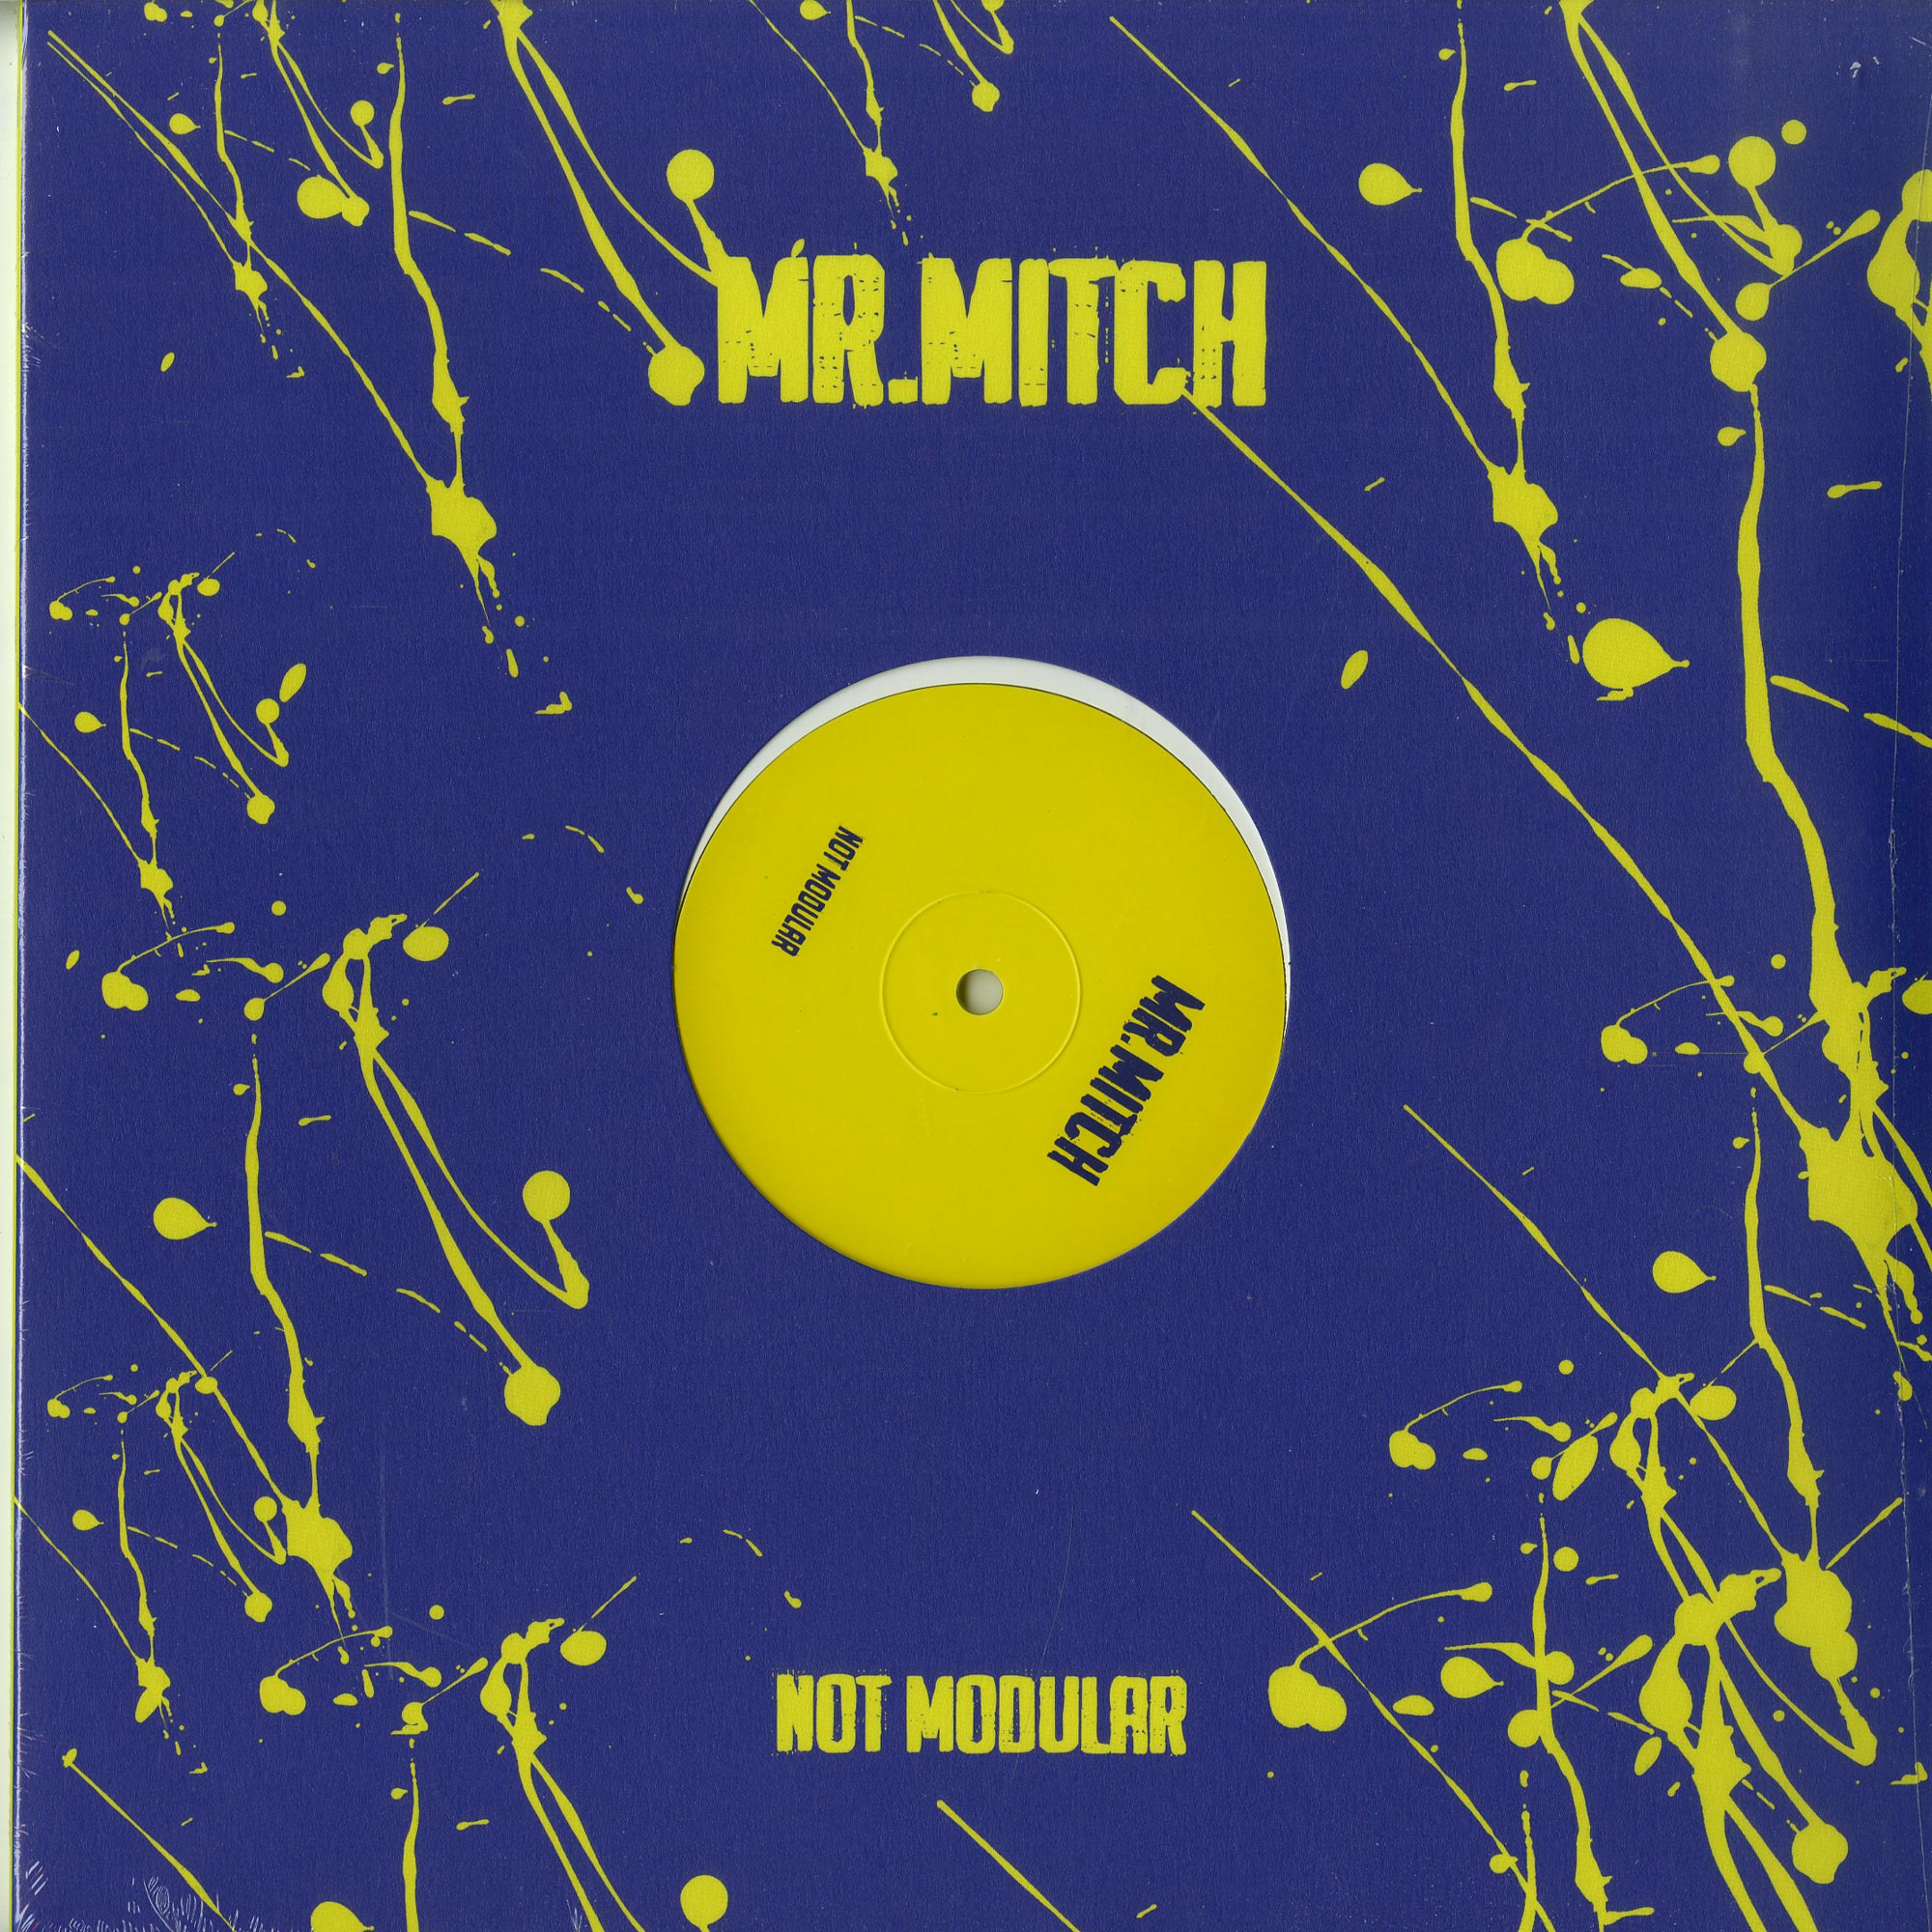 Mr. Mitch - NOT MODULAR